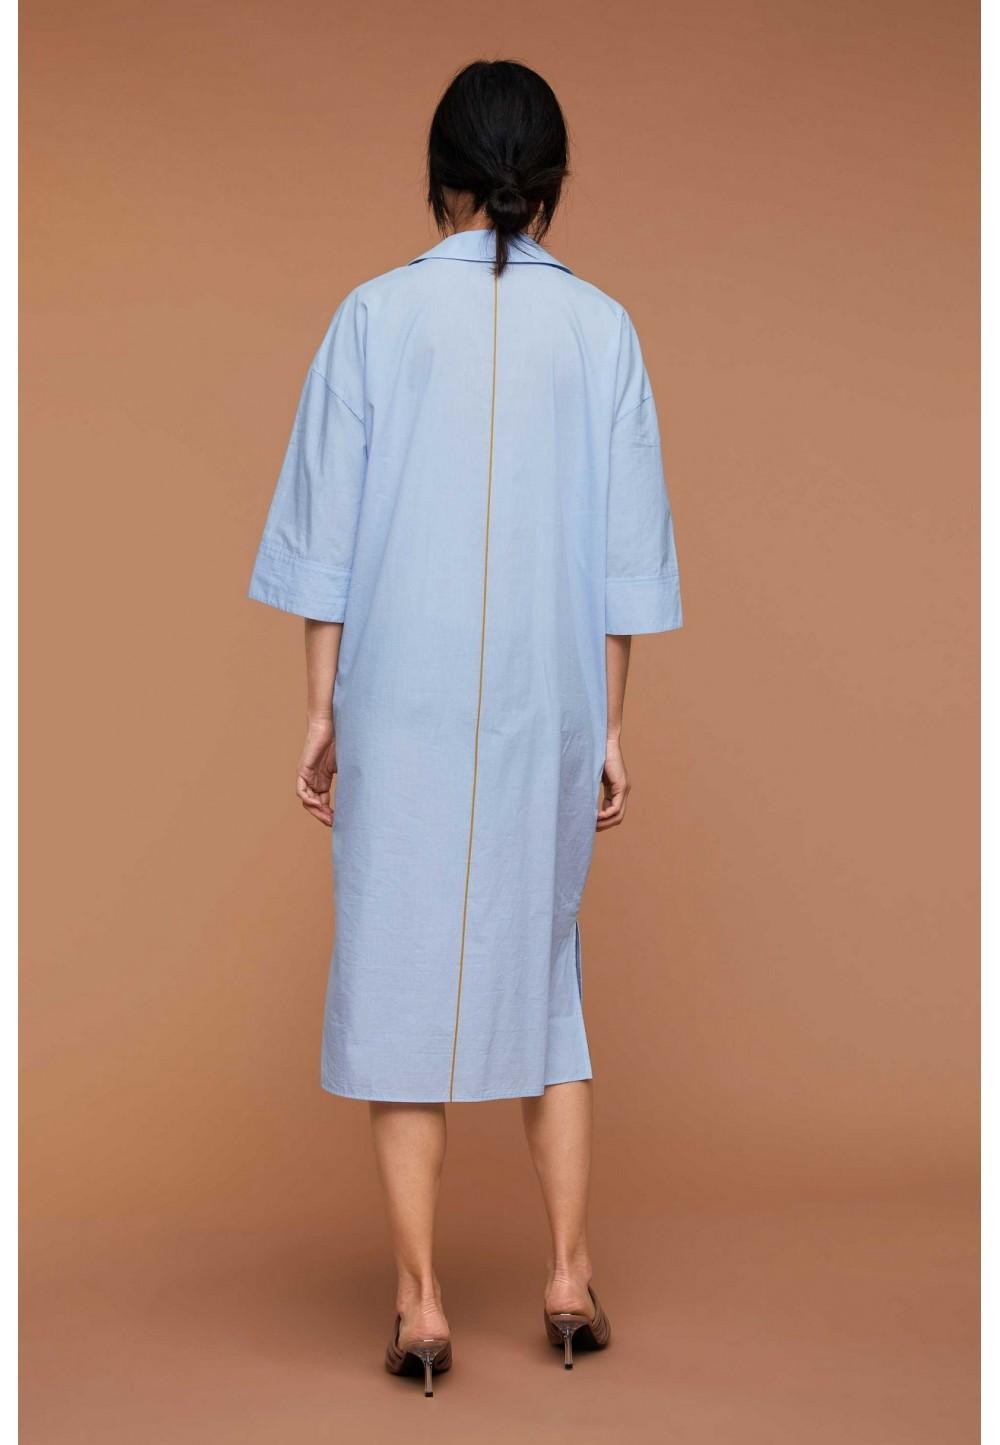 Женское платье-рубашка Charri